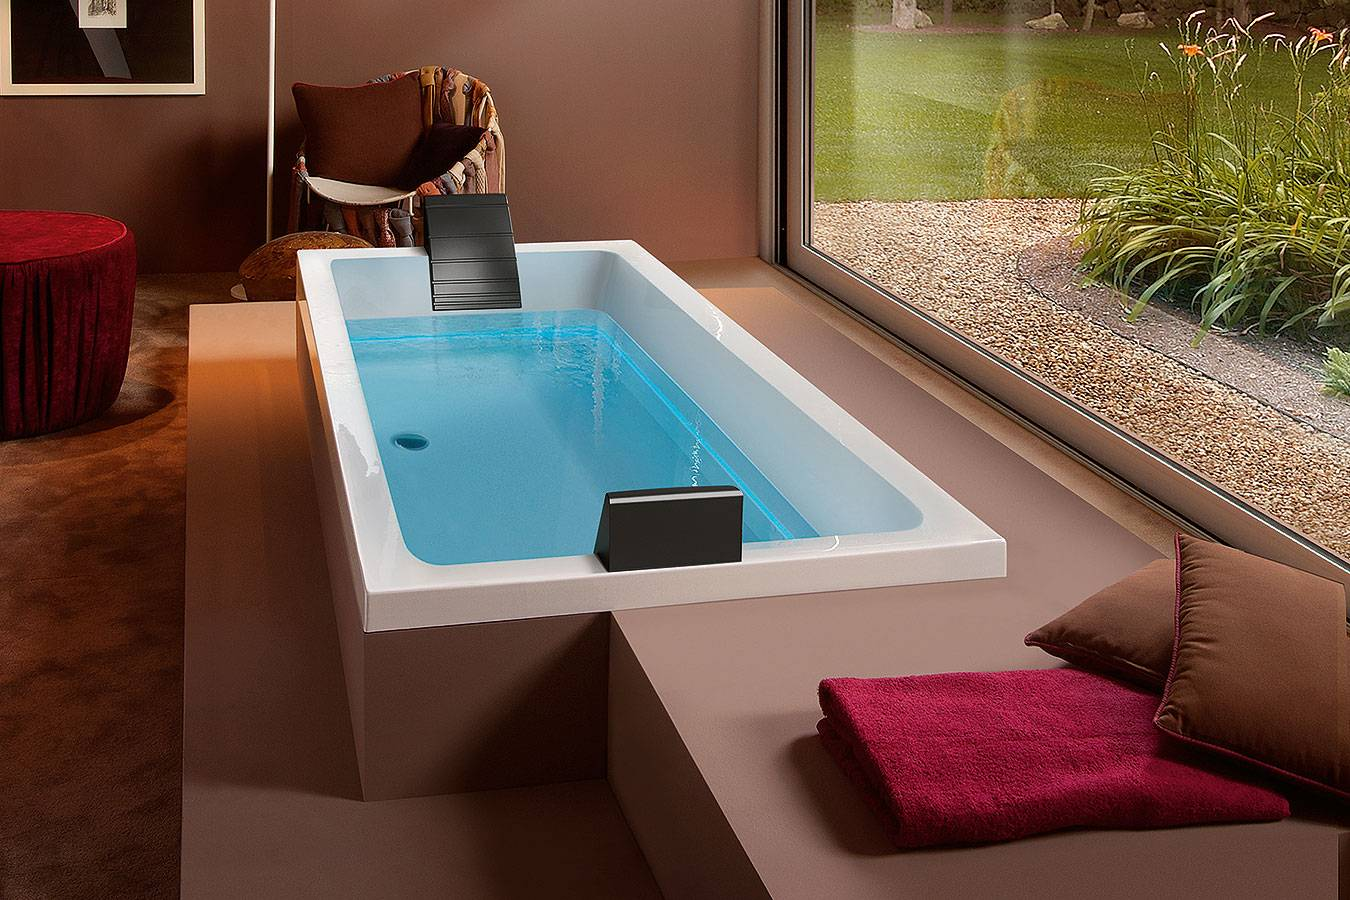 Bathtub rectangular whirlpool ghost system Dream 180 Treesse